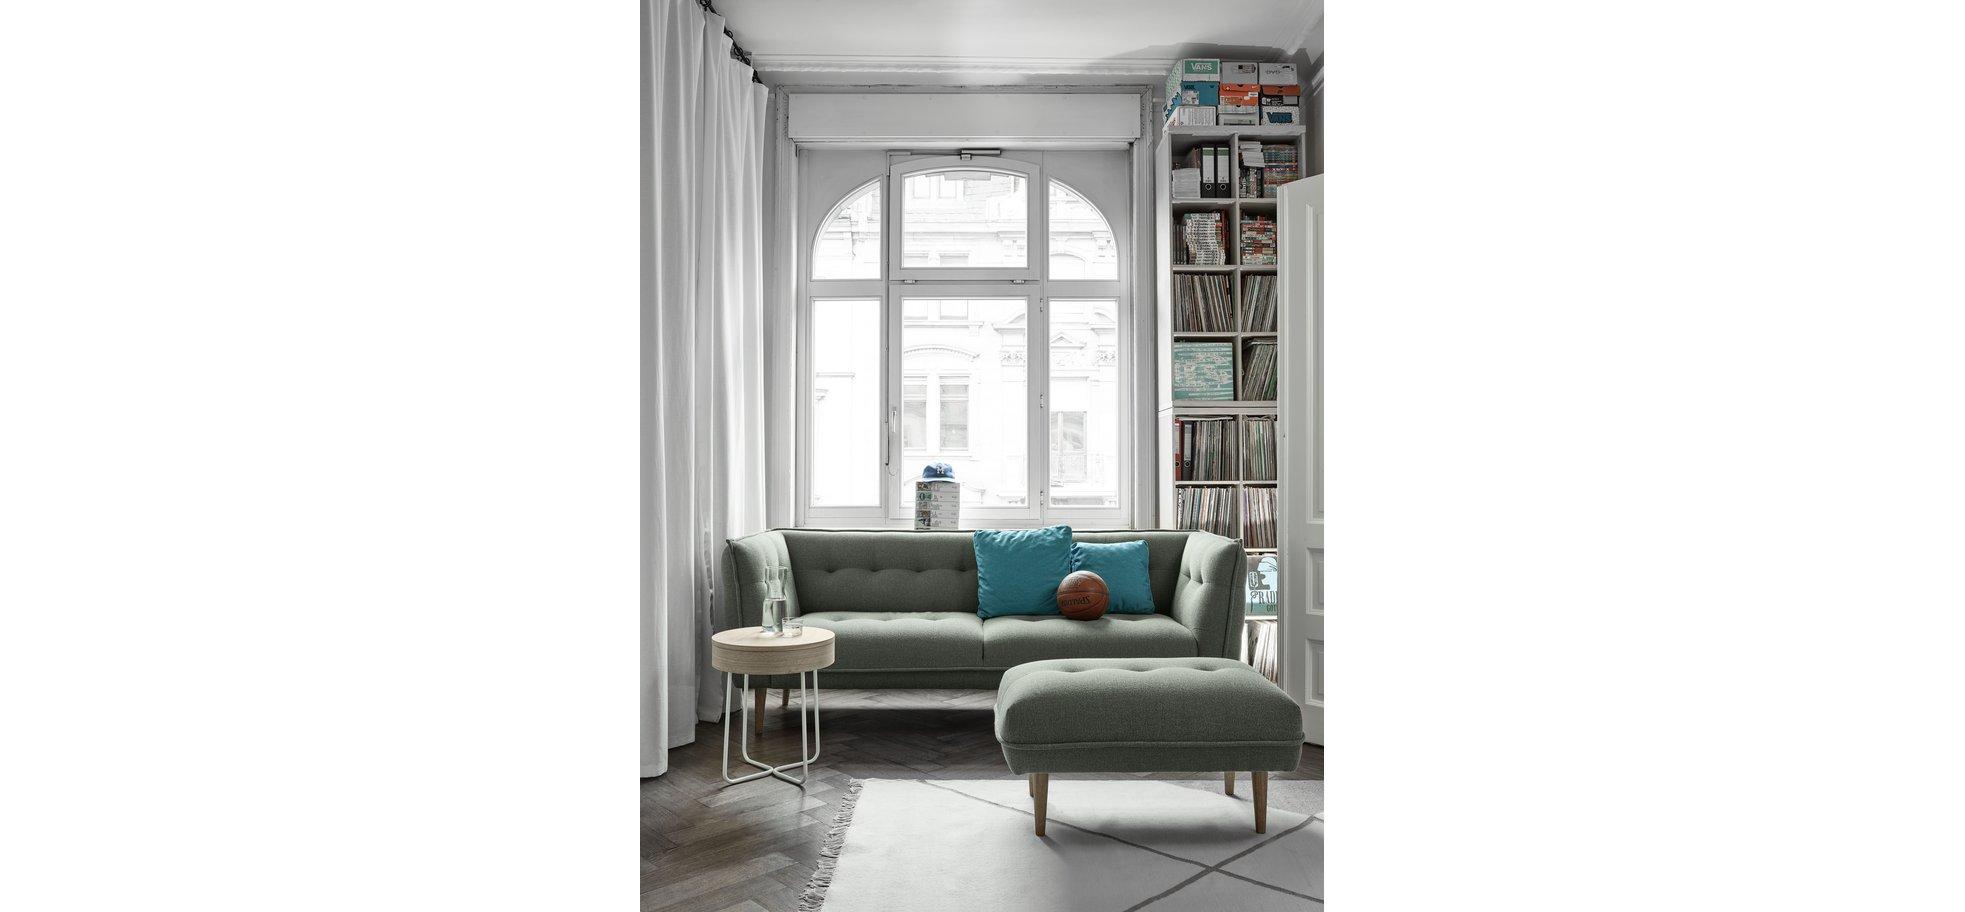 Möbel Hesse Hannover emejing möbel hesse küchen photos house design ideas cuscinema us